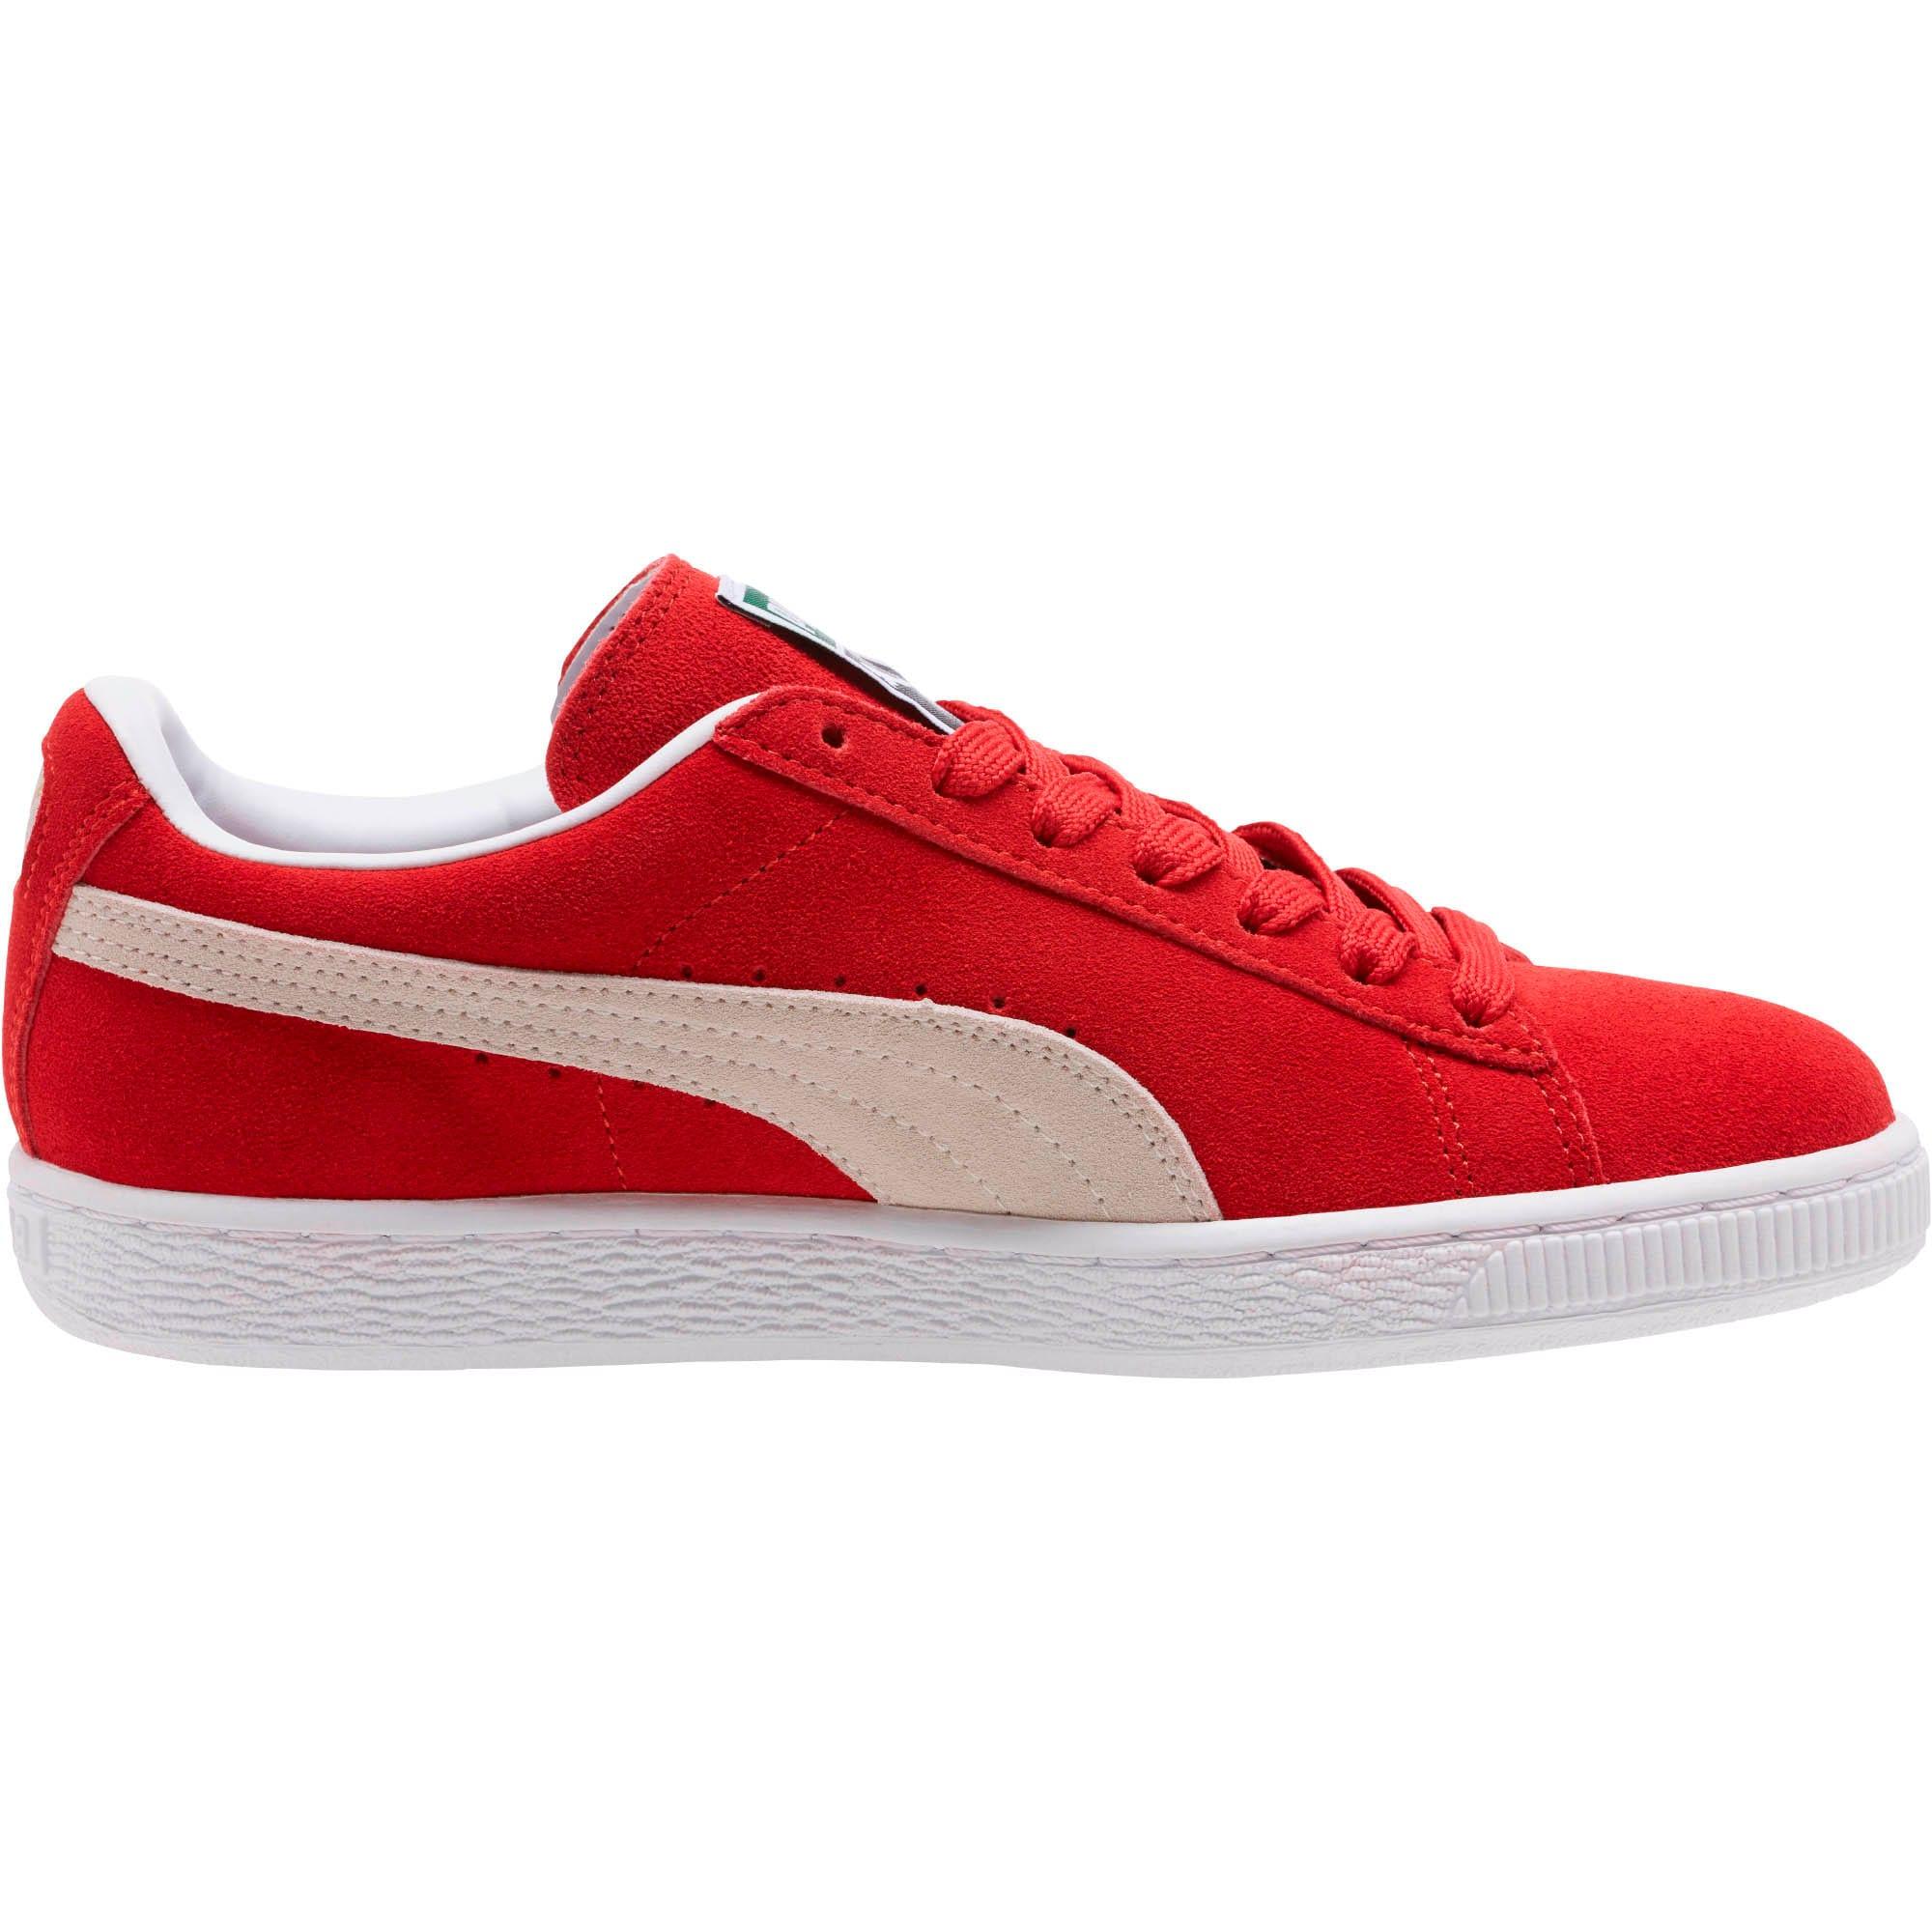 hot sale online c1627 20be4 Suede Classic + Women's Sneakers